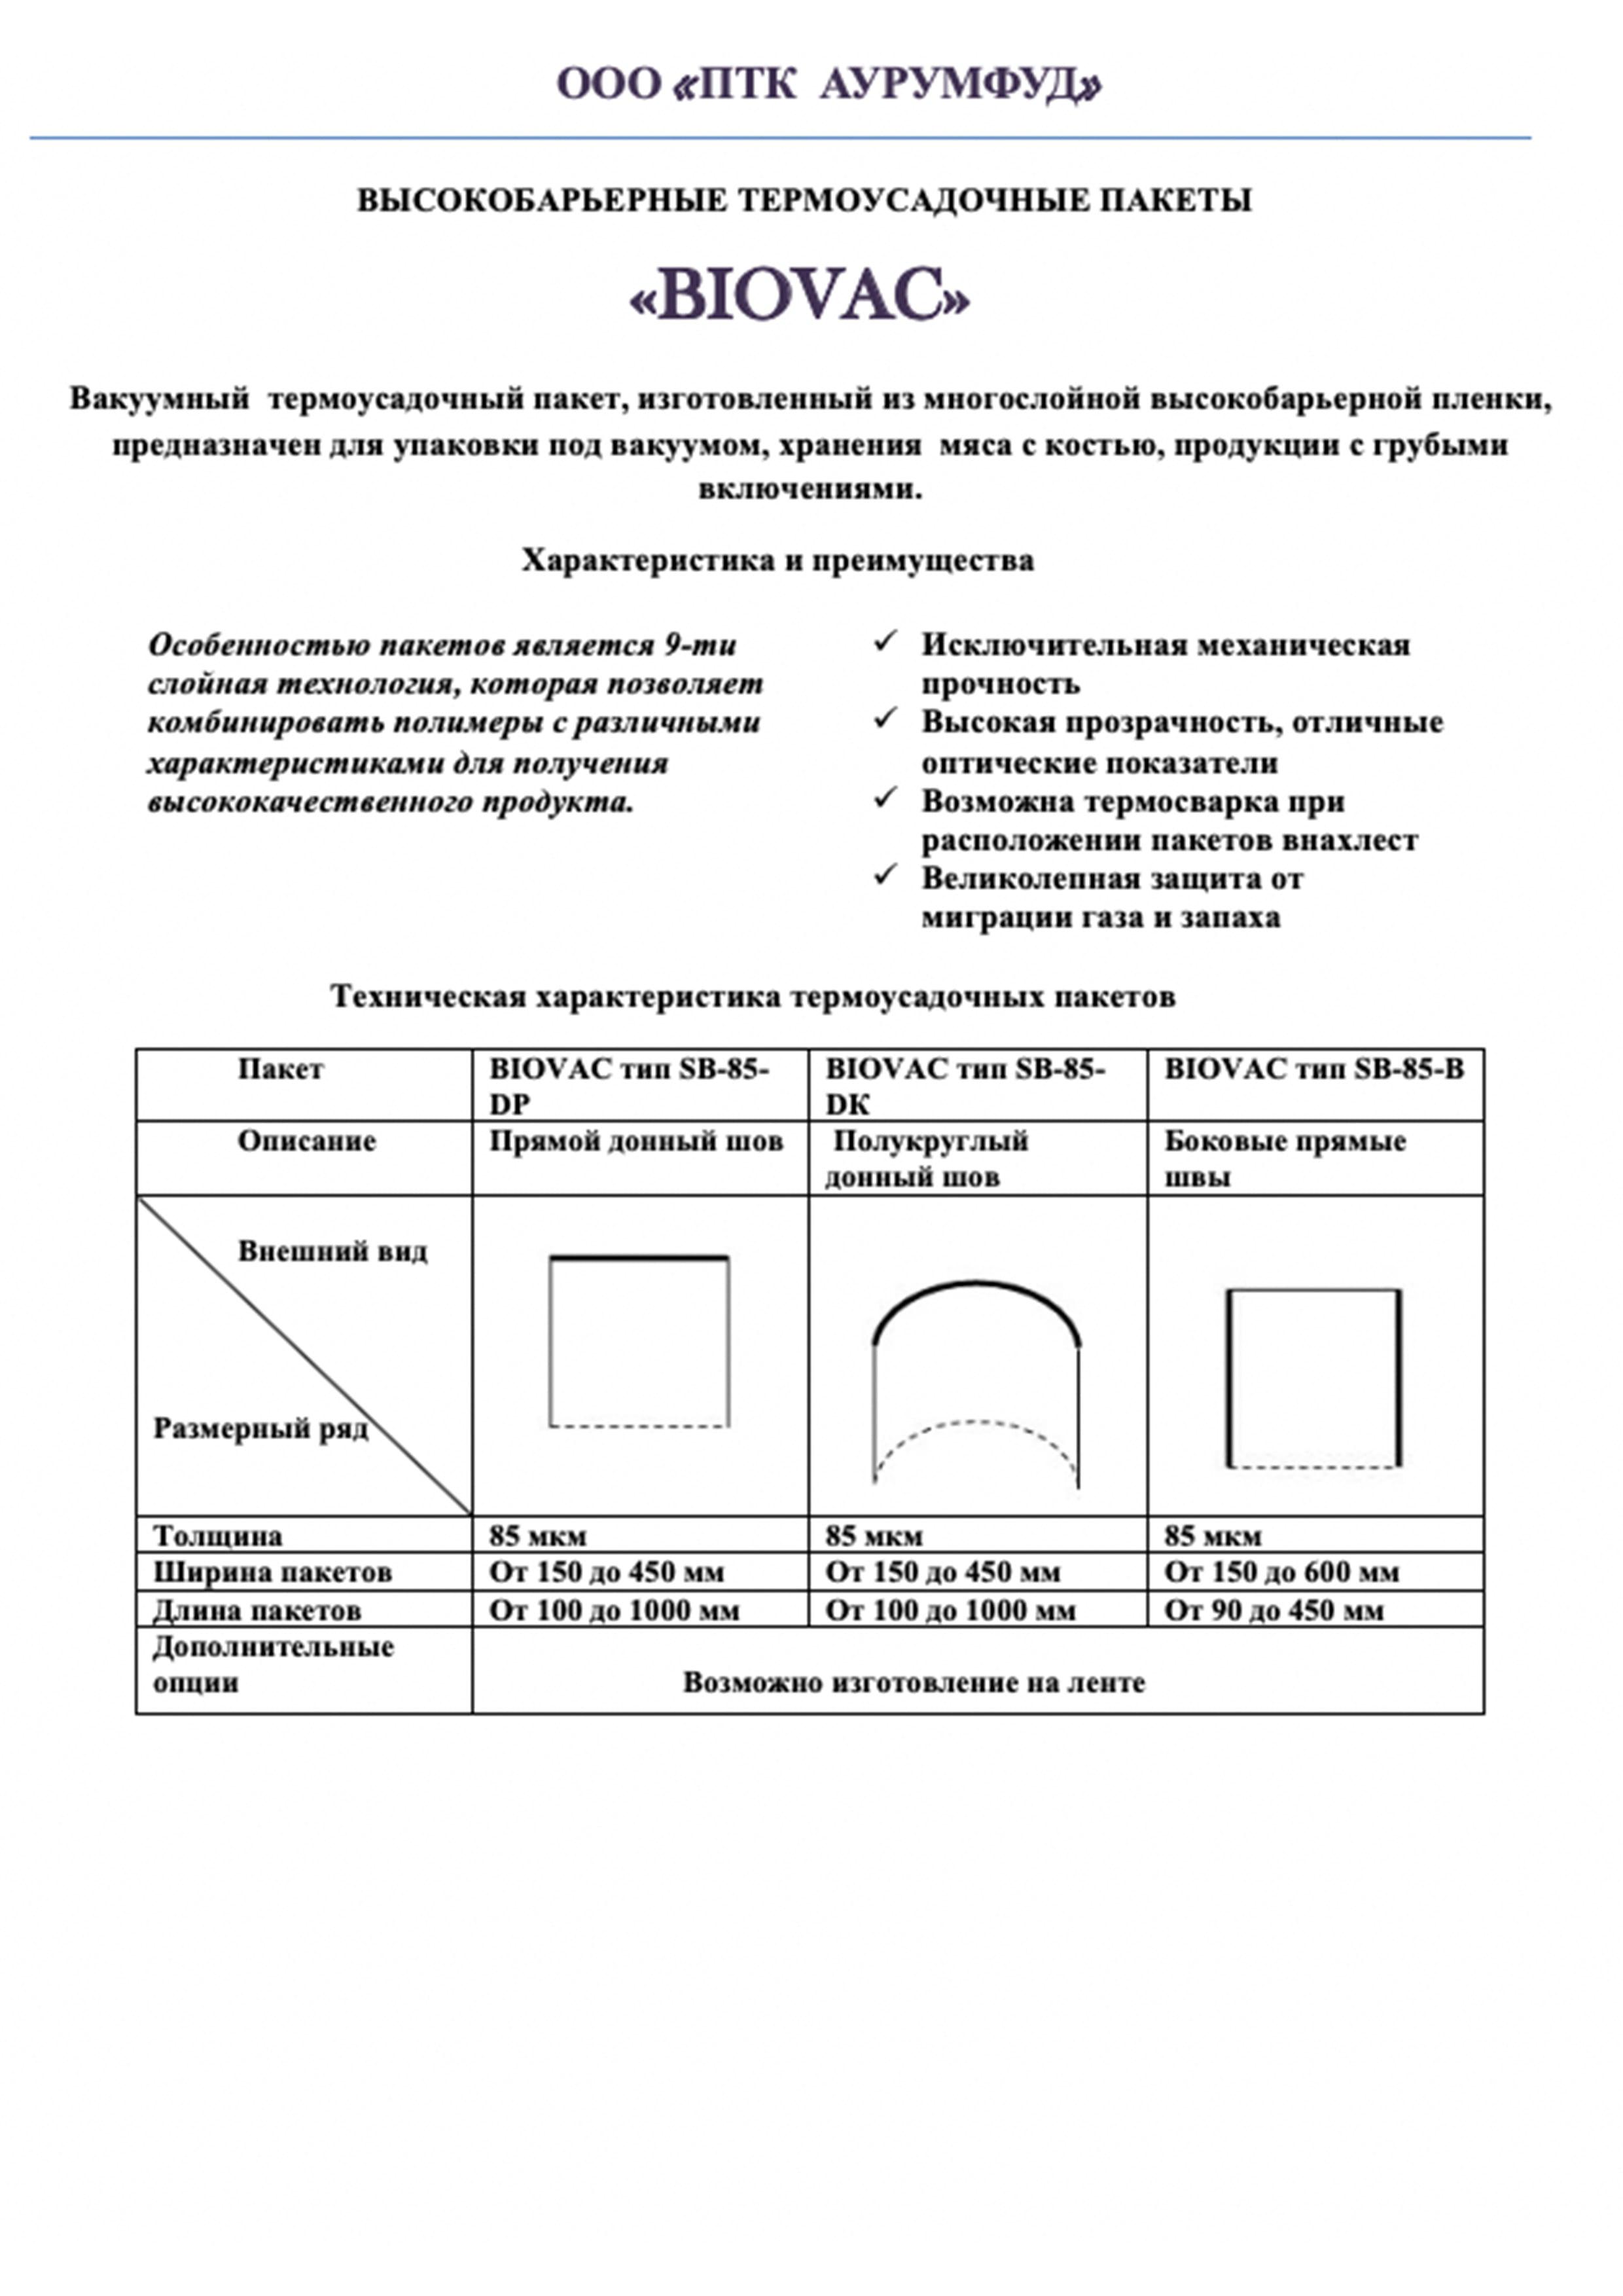 BIOVAC SB 85 Тех инструкции